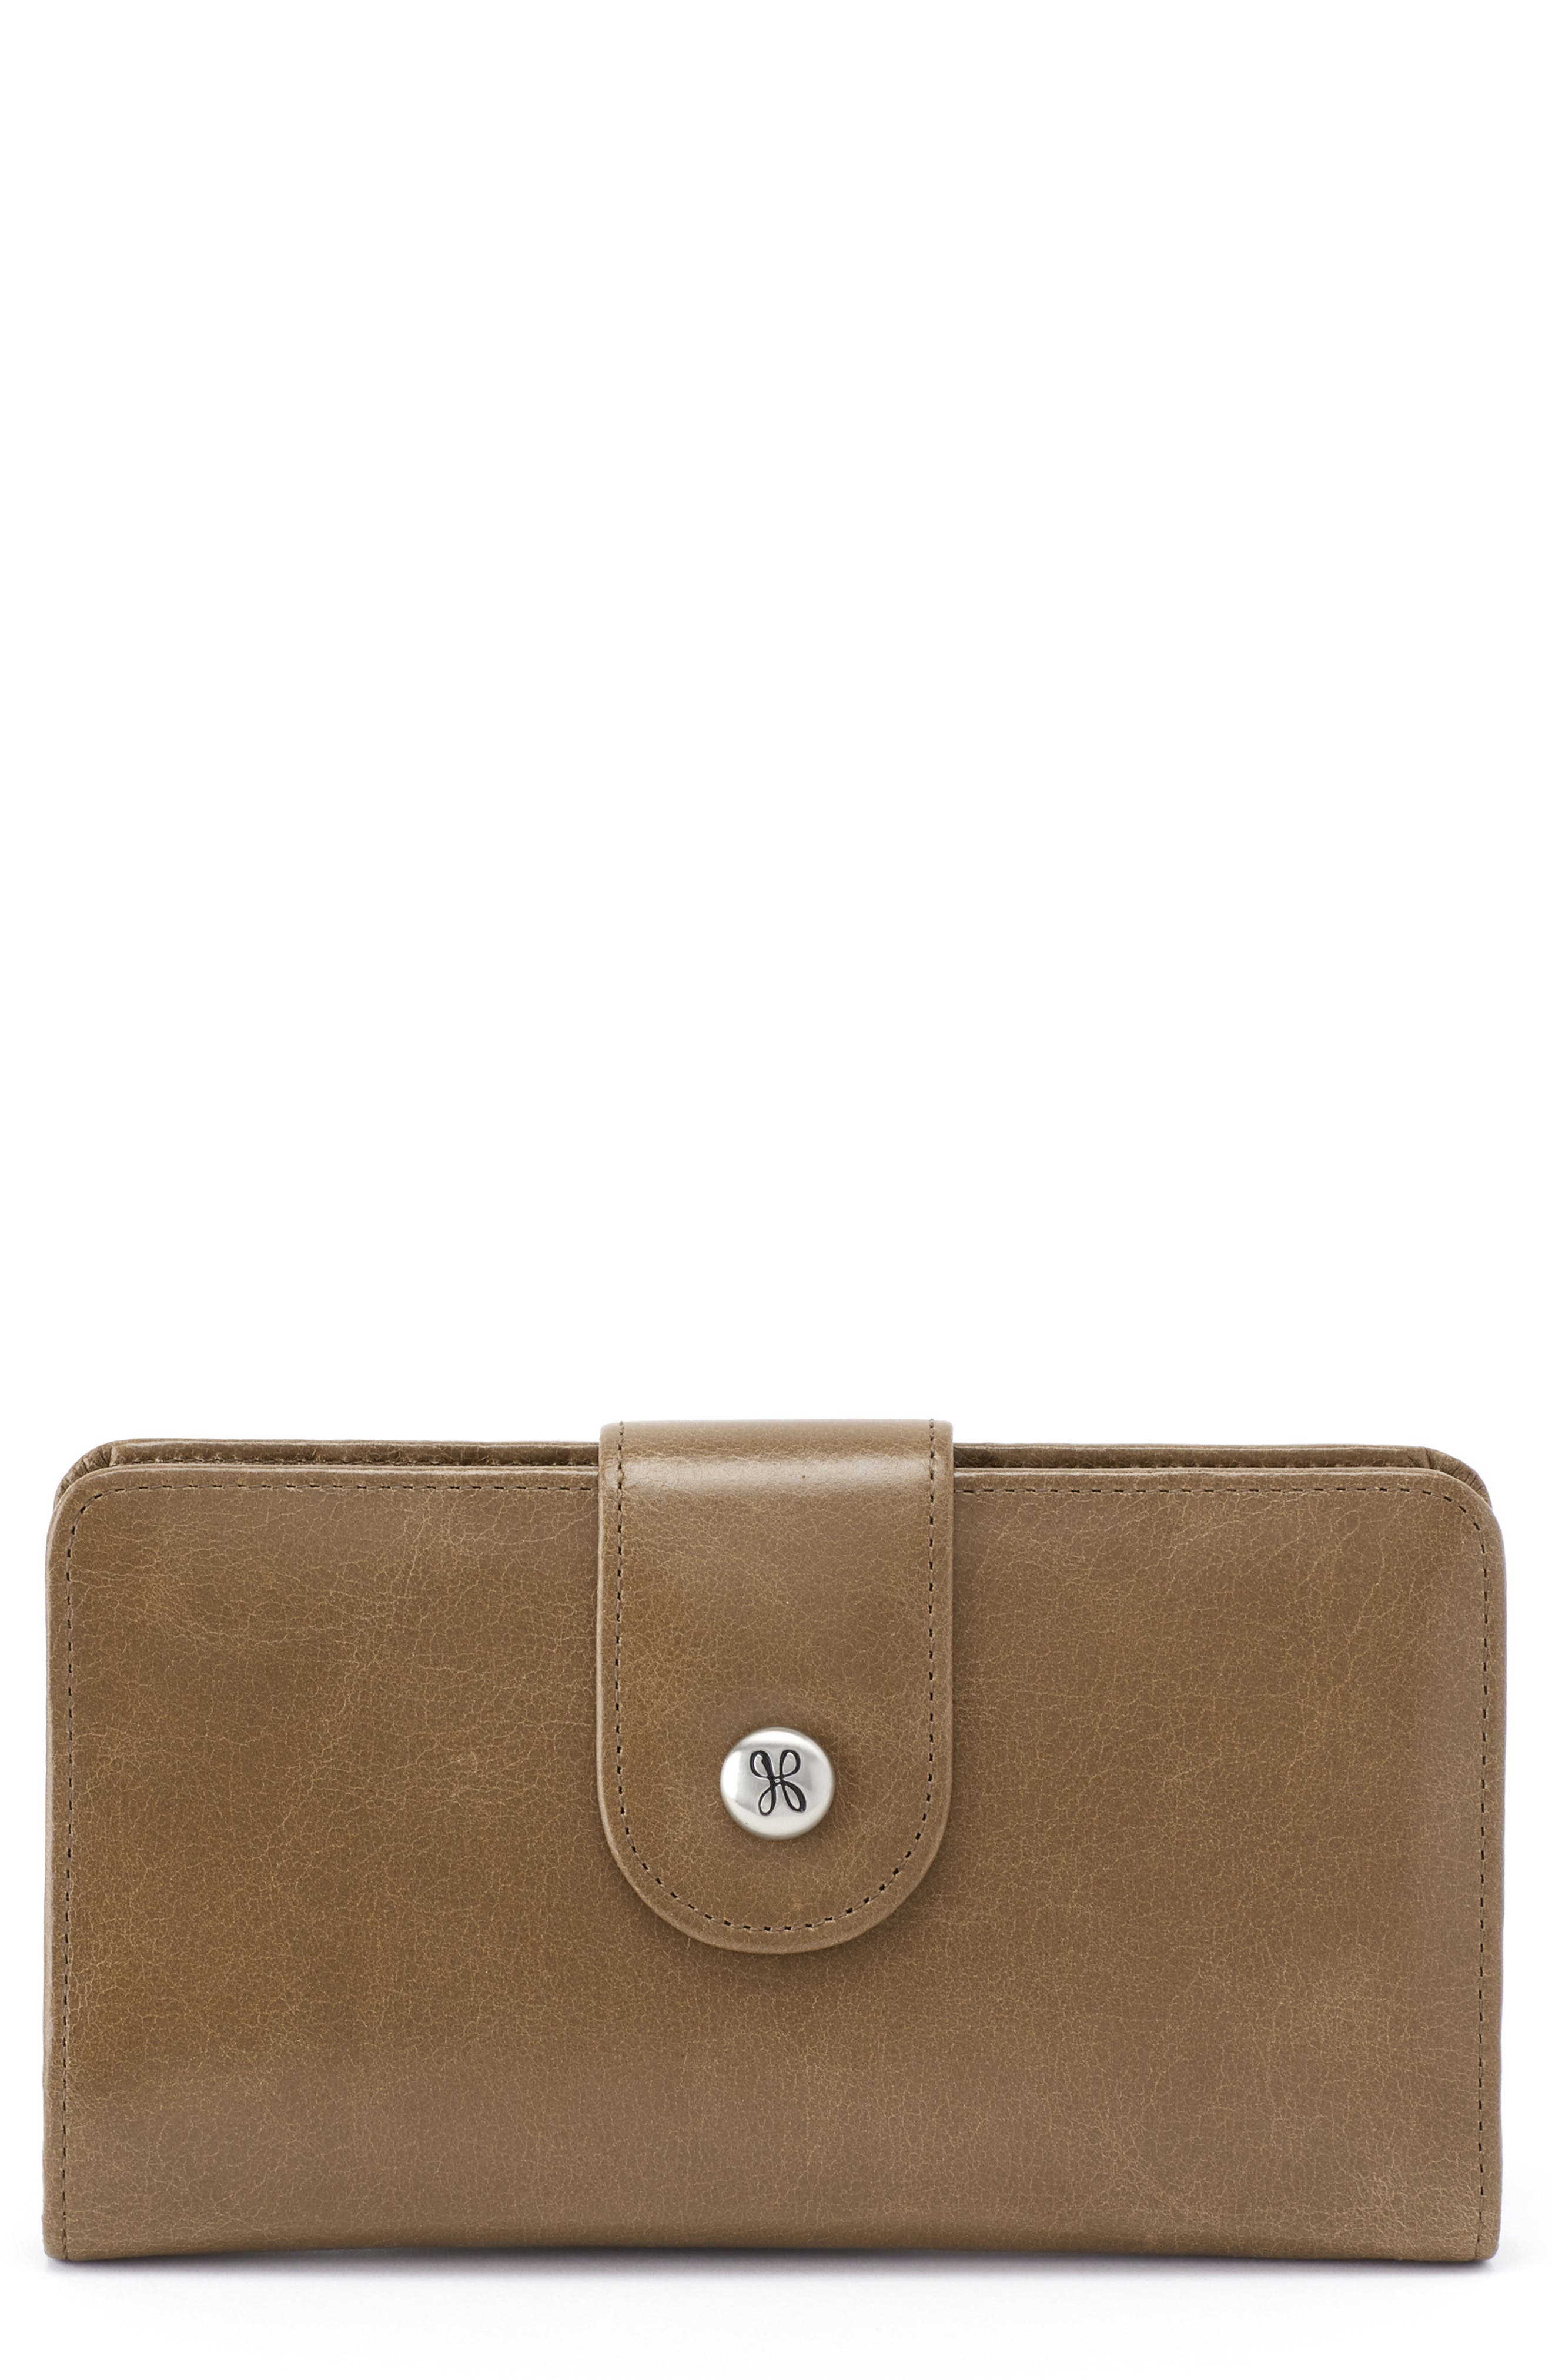 Danette Glazed Continental Wallet,                             Main thumbnail 1, color,                             MINK